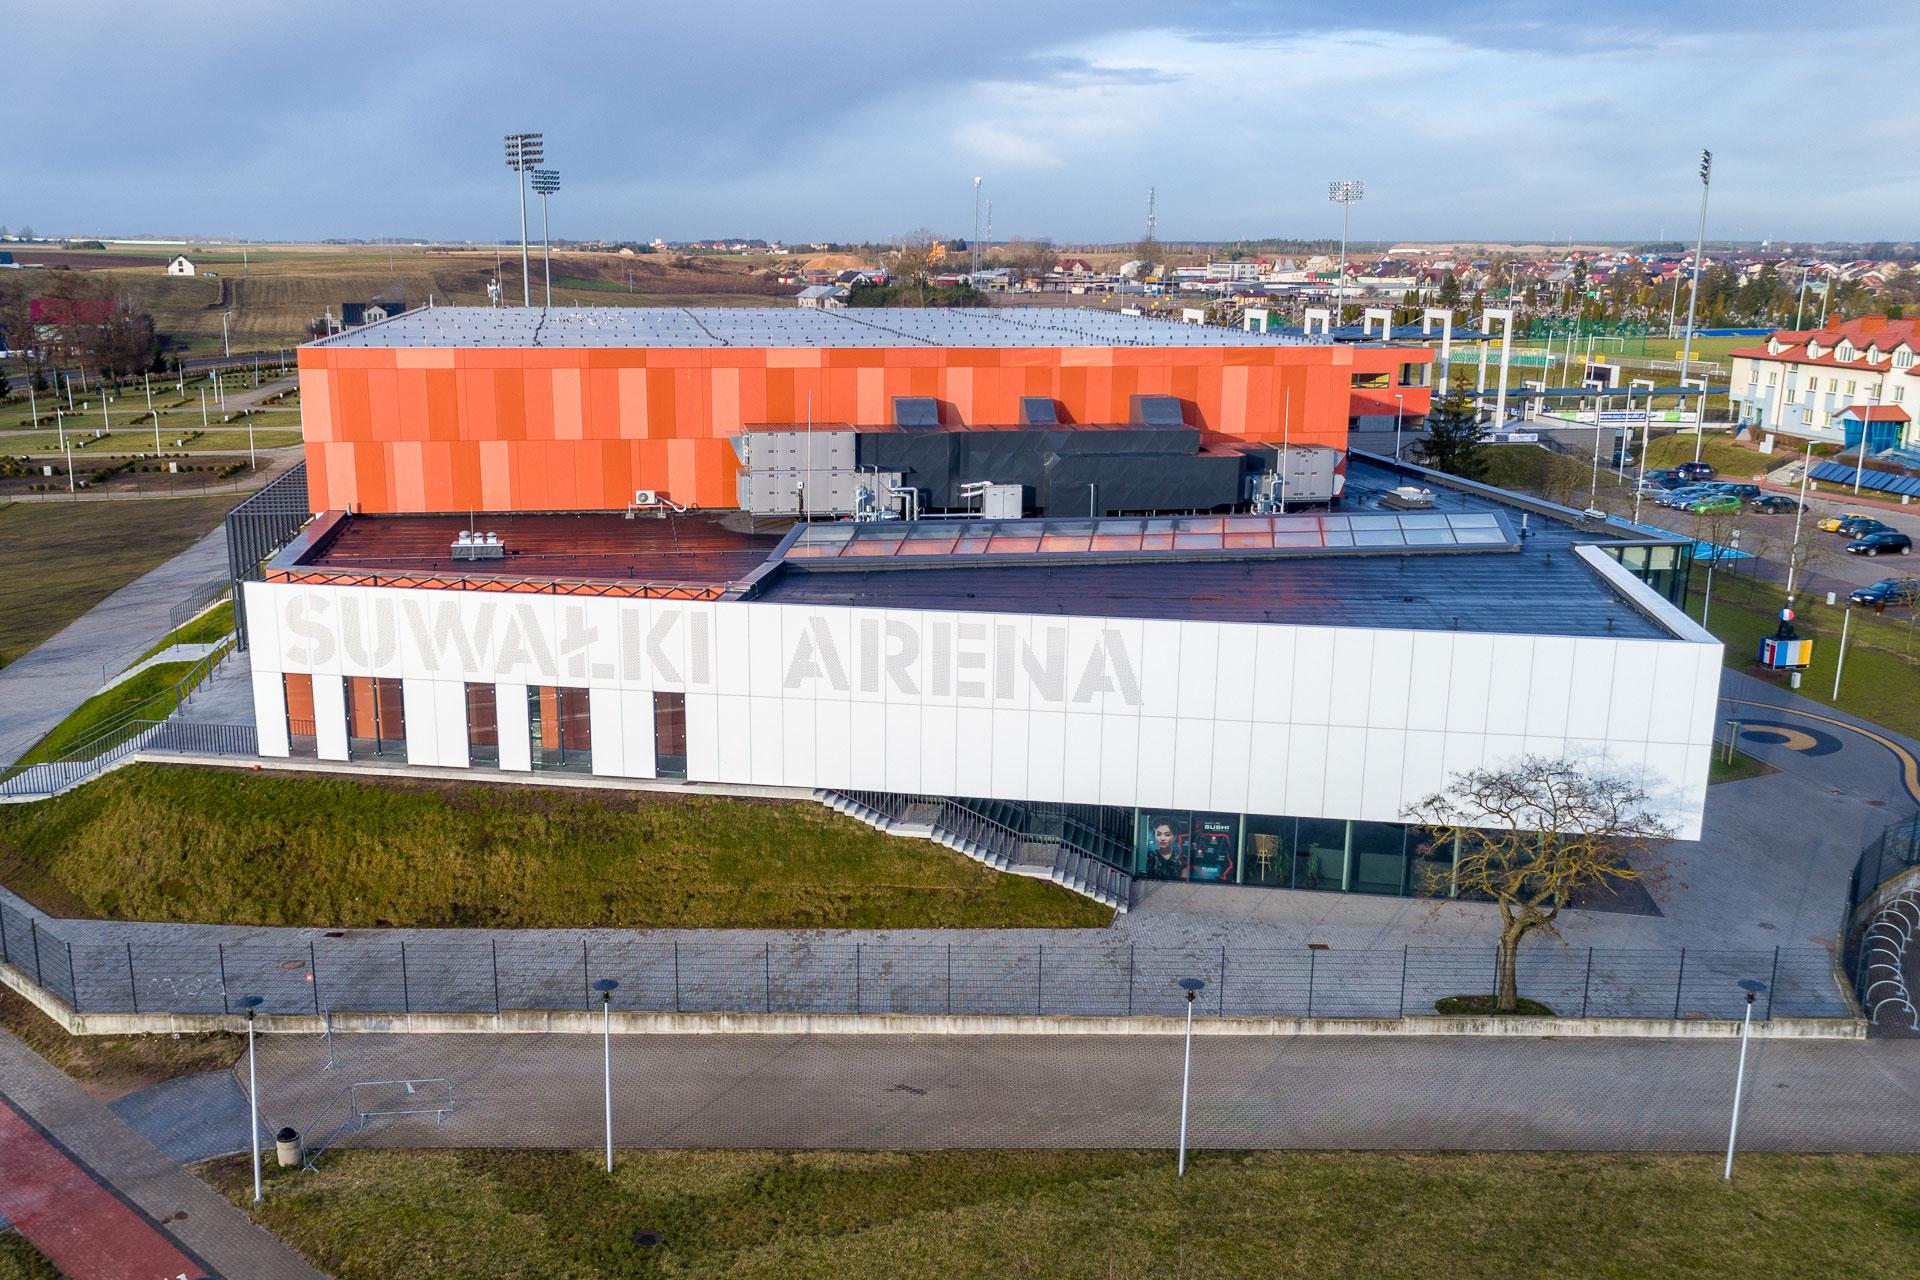 PL-Suwalki-Arena-036